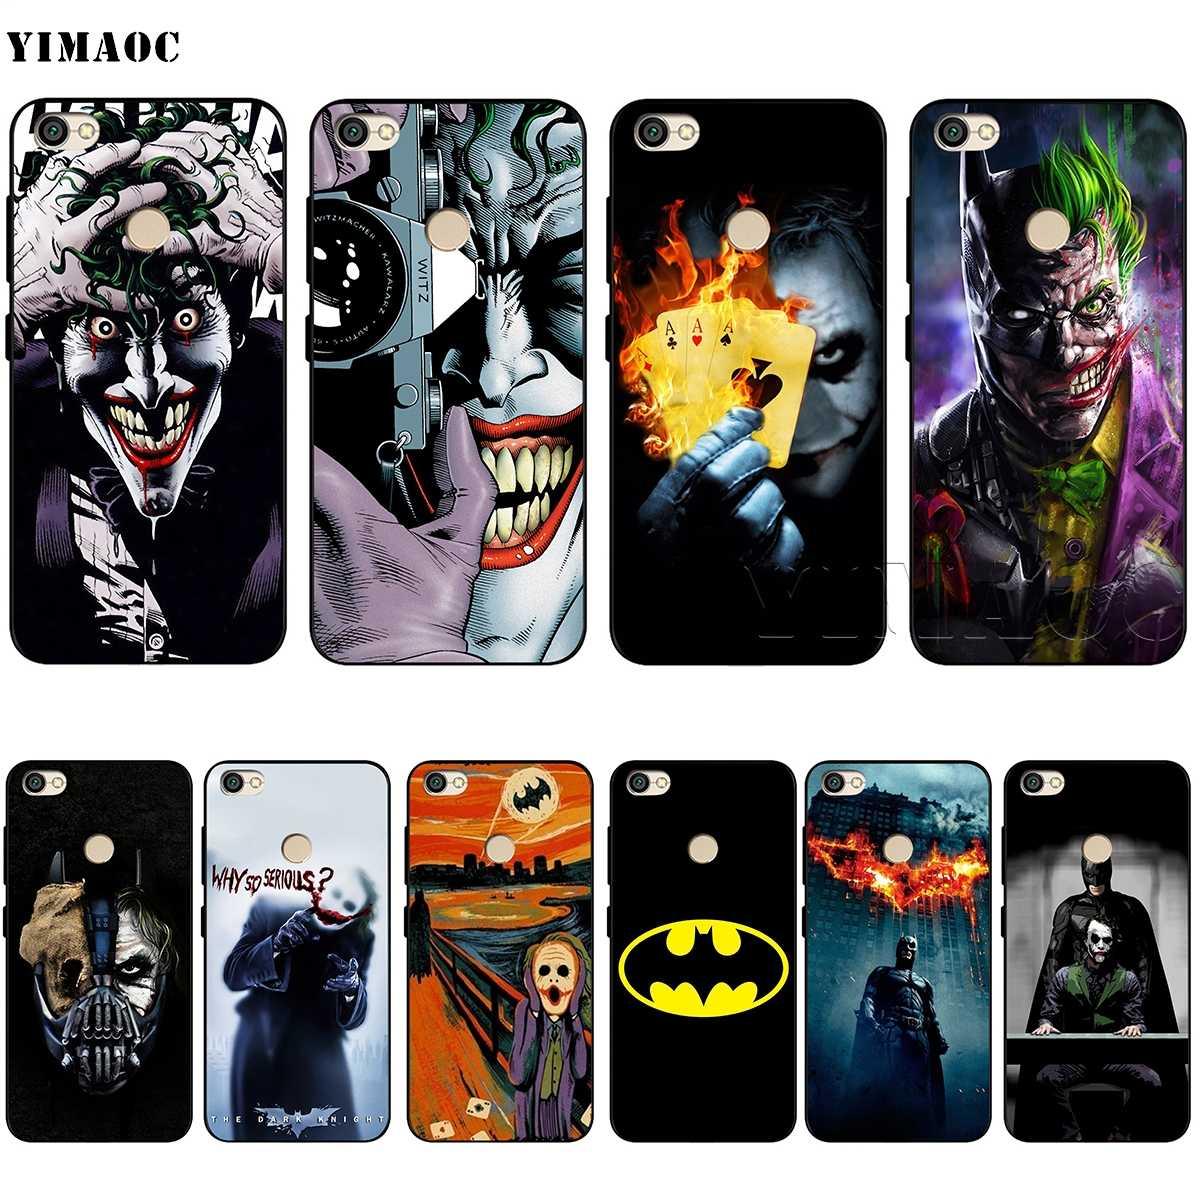 YIMAOC Бэтмен Джокер, Темный рыцарь мягкий чехол из термопластичного полиуретана для Xiaomi Redmi mi Note MAX 3 6 6A 7 mi 6 mi 8 9 se a1 a2 Pro Lite go pocophone f1